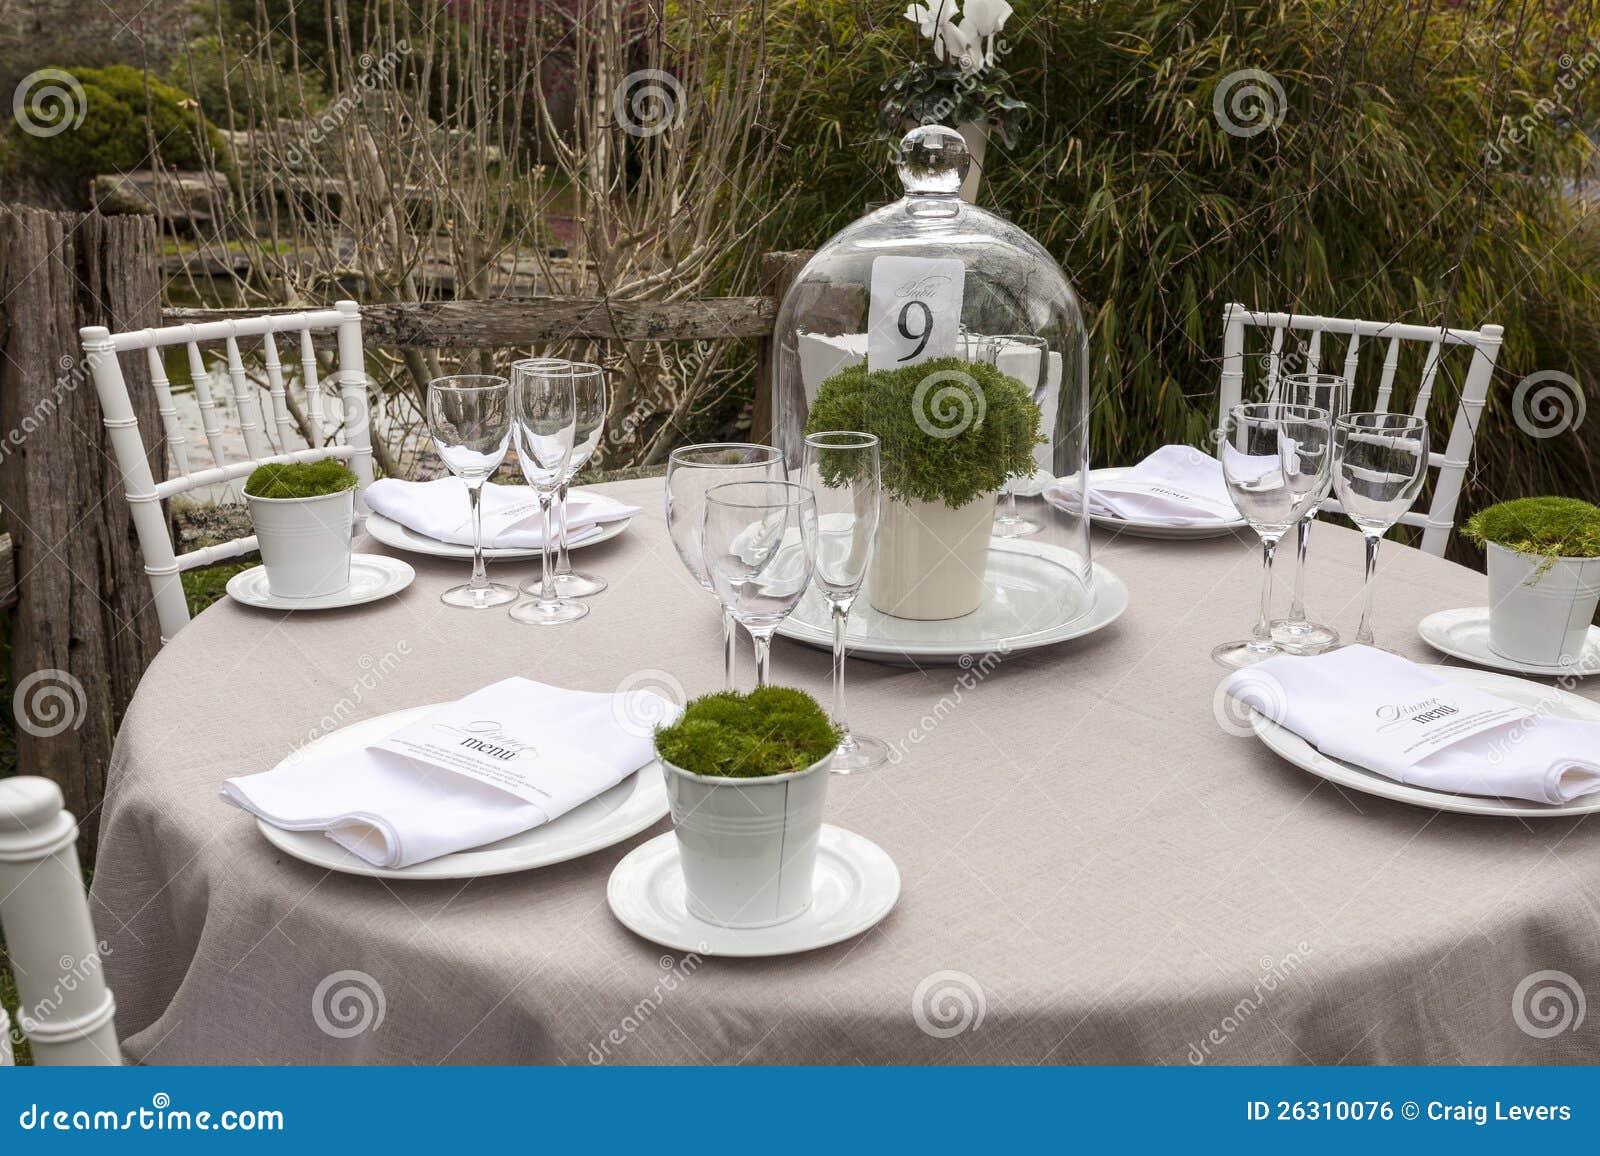 Wedding table setting 9 stock photo image of table for Garden wedding table settings